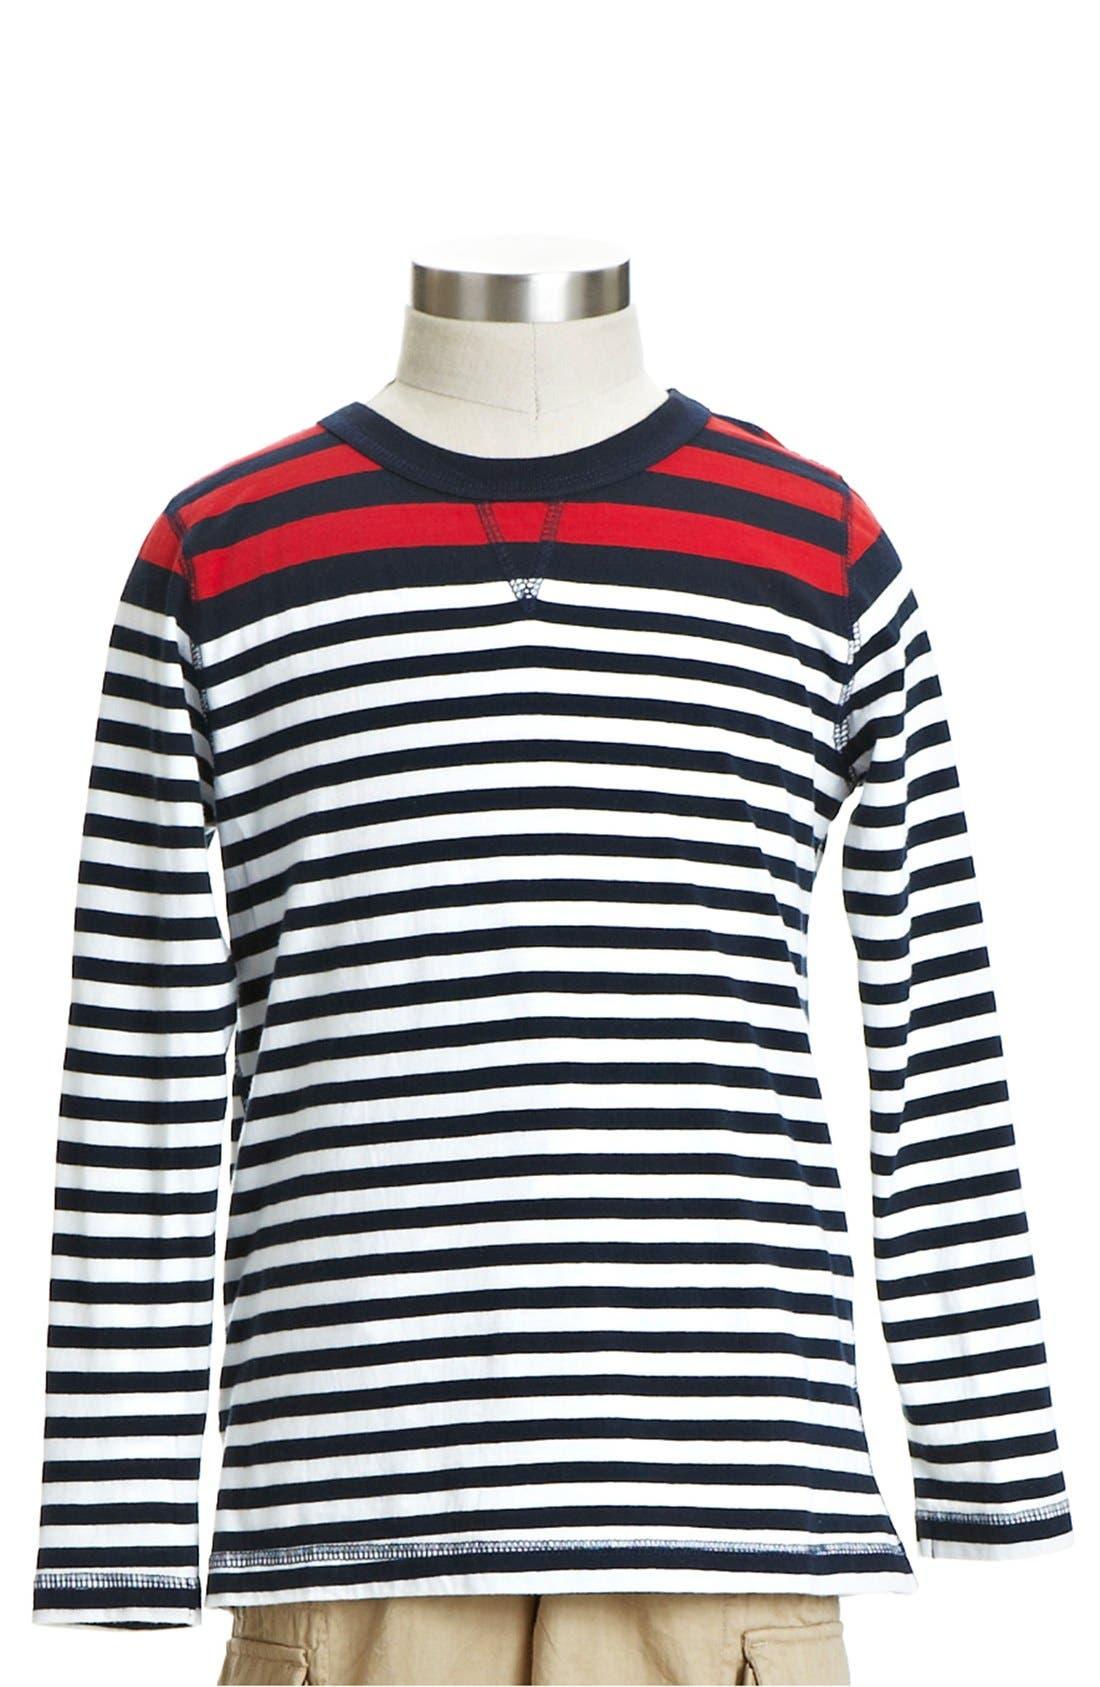 Main Image - Peek 'Irving' Stripe T-Shirt (Toddler Boys, Little Boys & Big Boys)